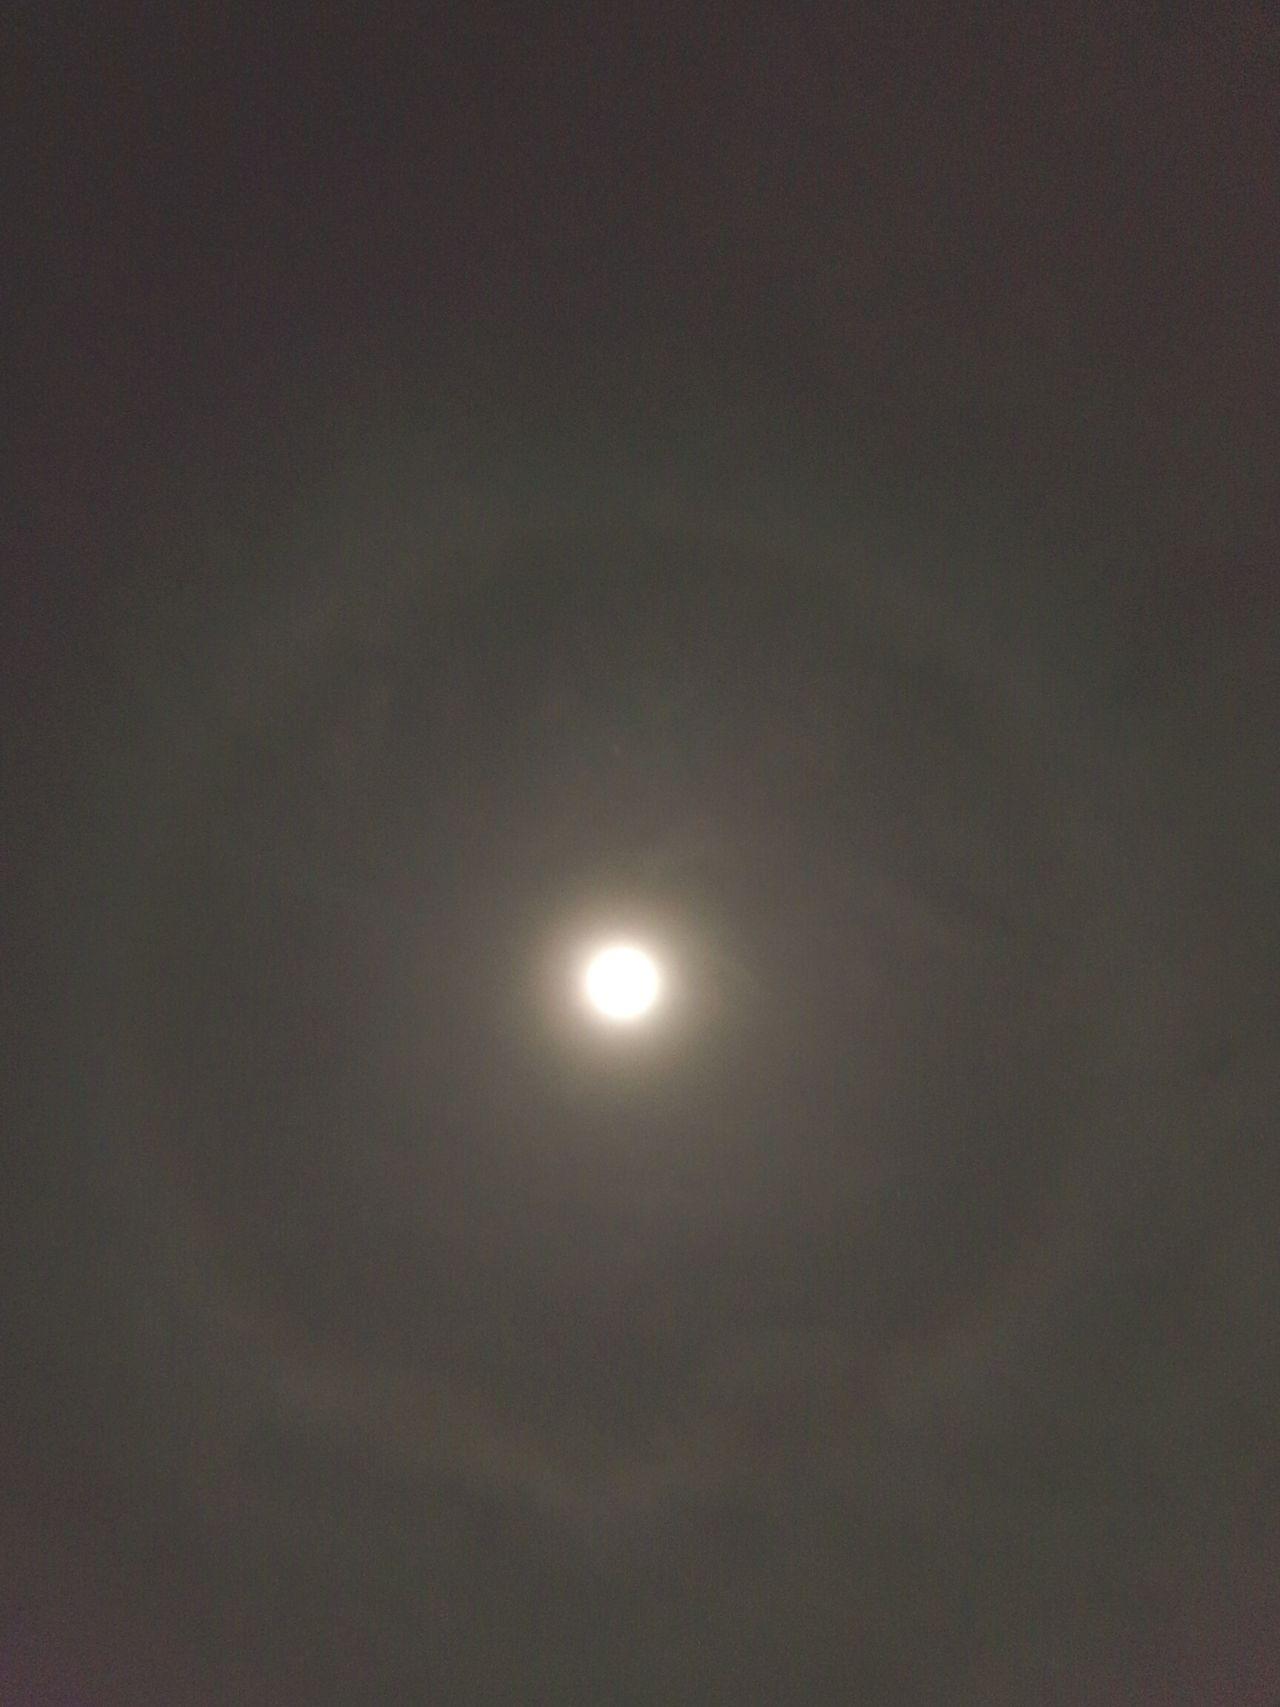 Full Moon 🌕 Haloaroundthemoon Sky Astronomy Space Moon Night No People Nature Outdoors Mean'sRainIsComing Loverofnature EyeEmBestShot's Full Frame Eyeemnaturelover